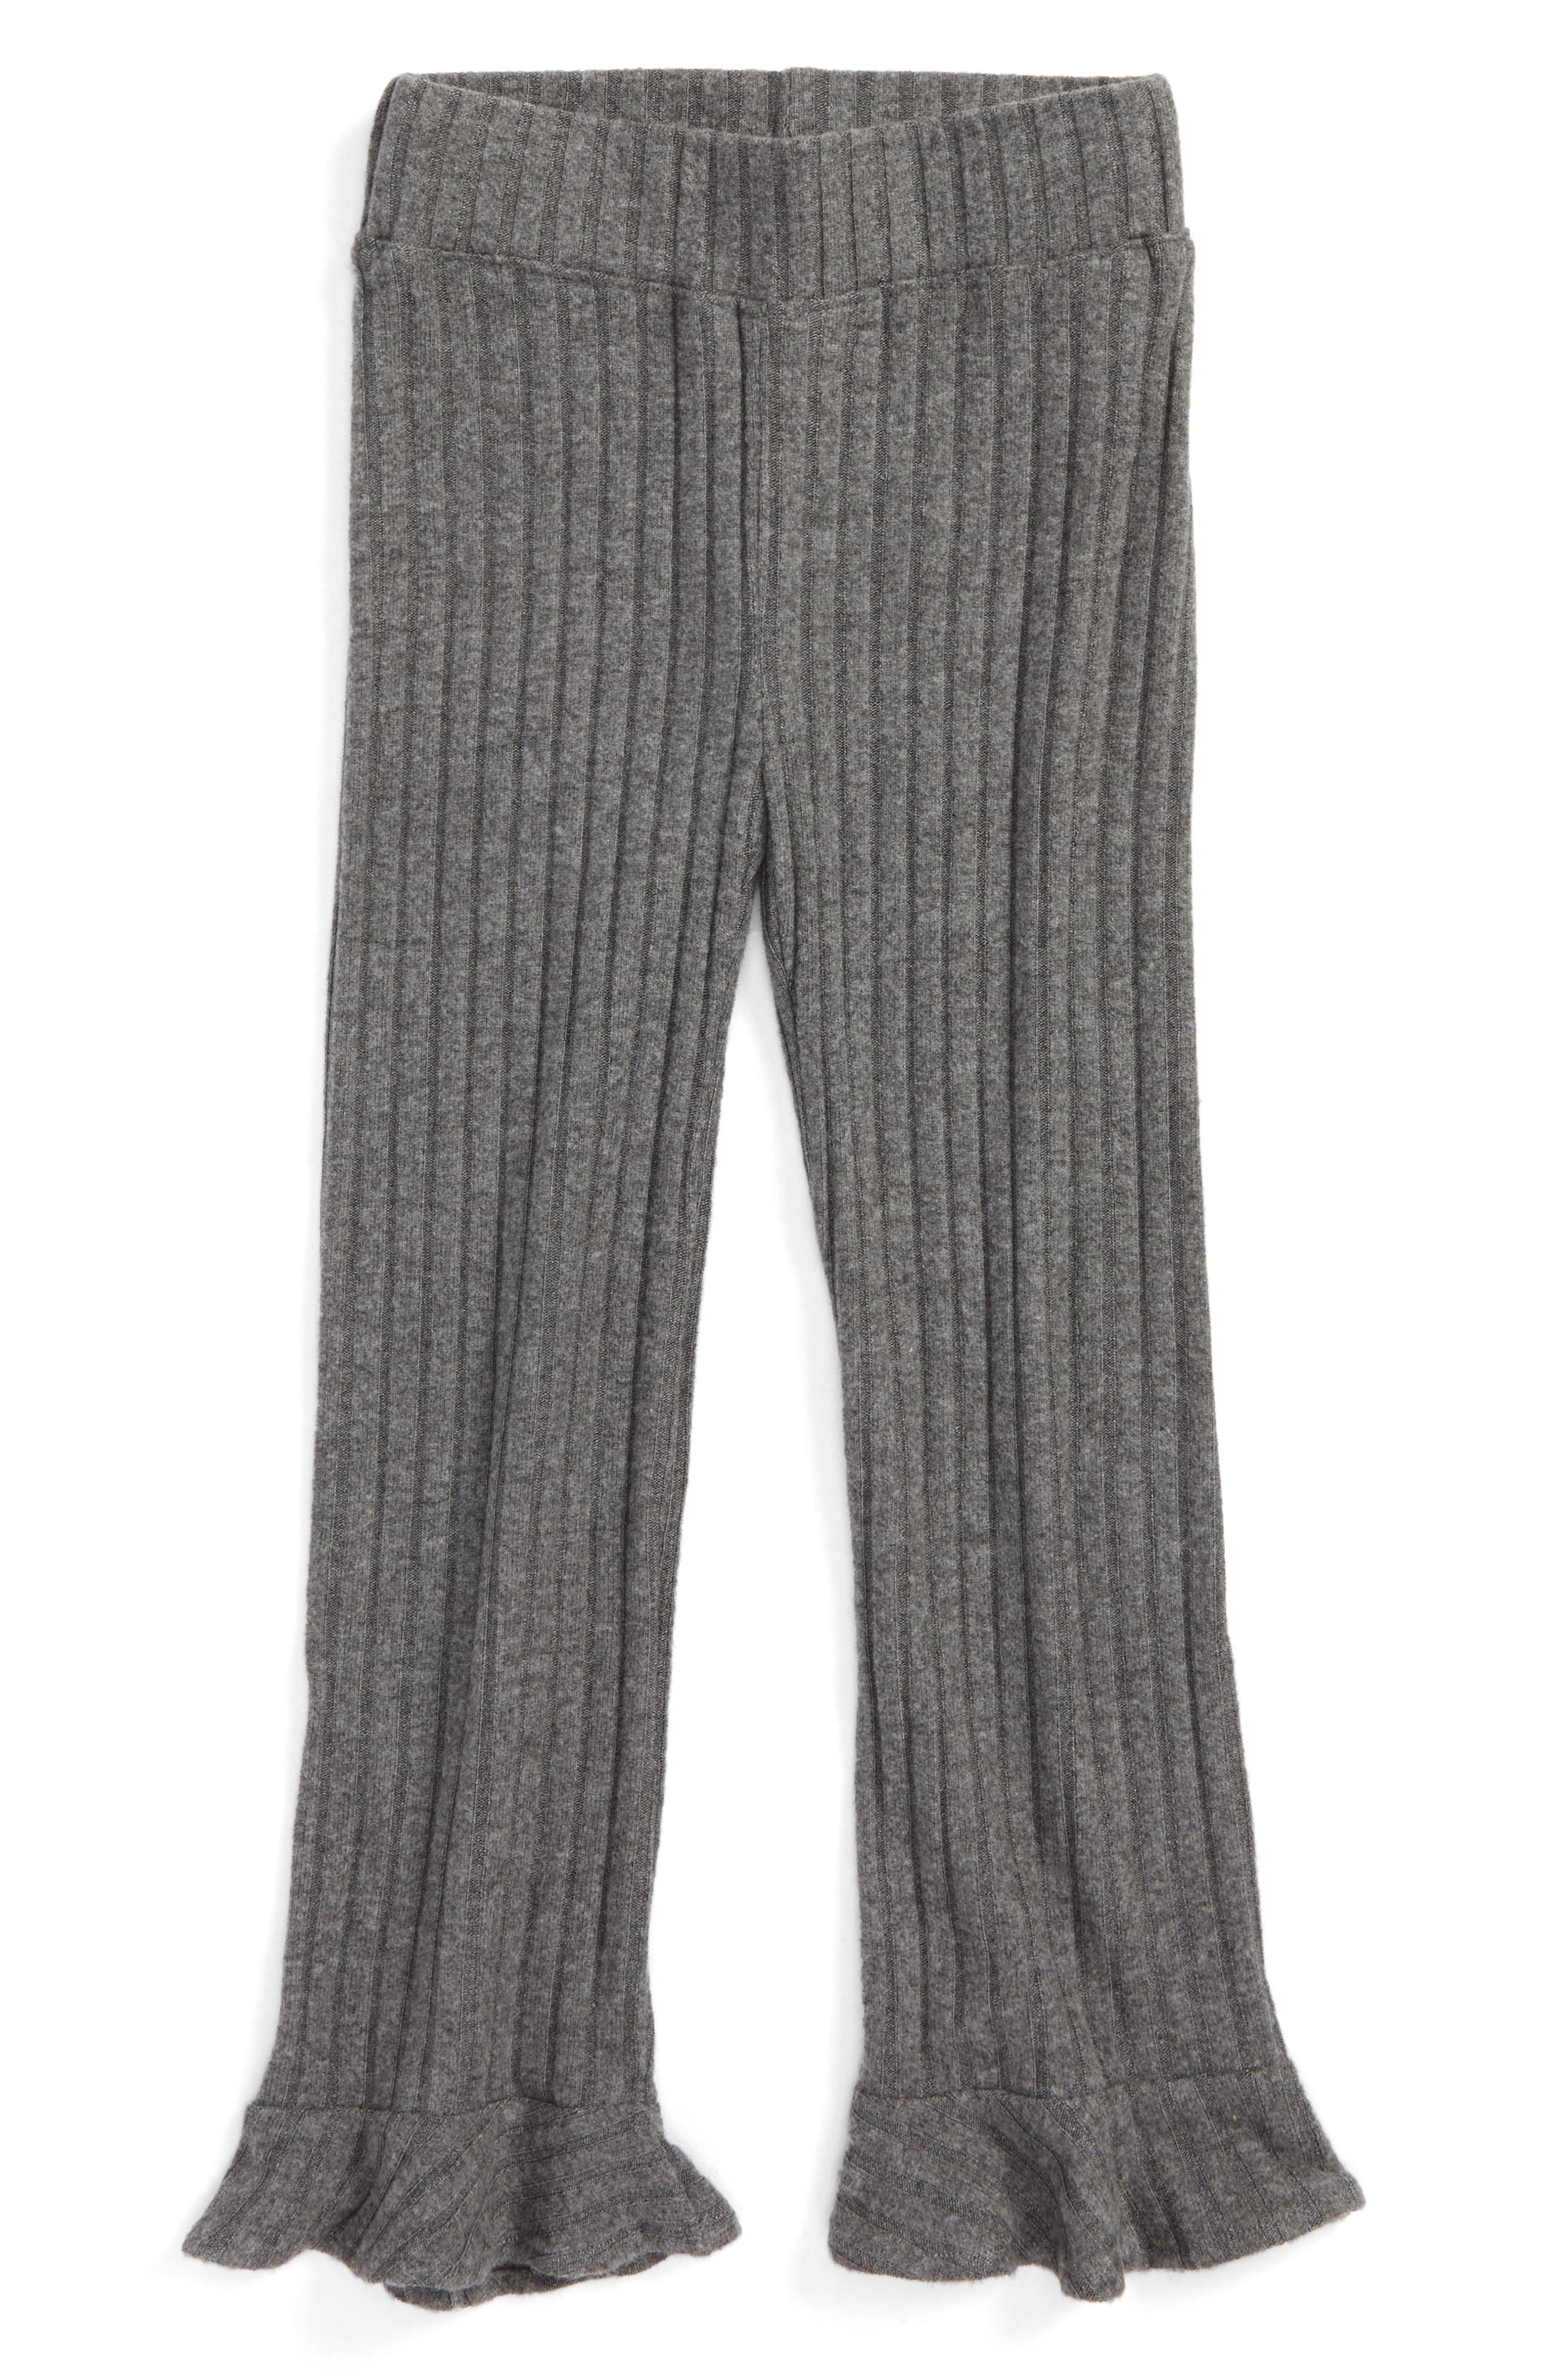 Penny Organic Cotton Flared Ruffle Pants,                             Main thumbnail 1, color,                             Charcoal Rib